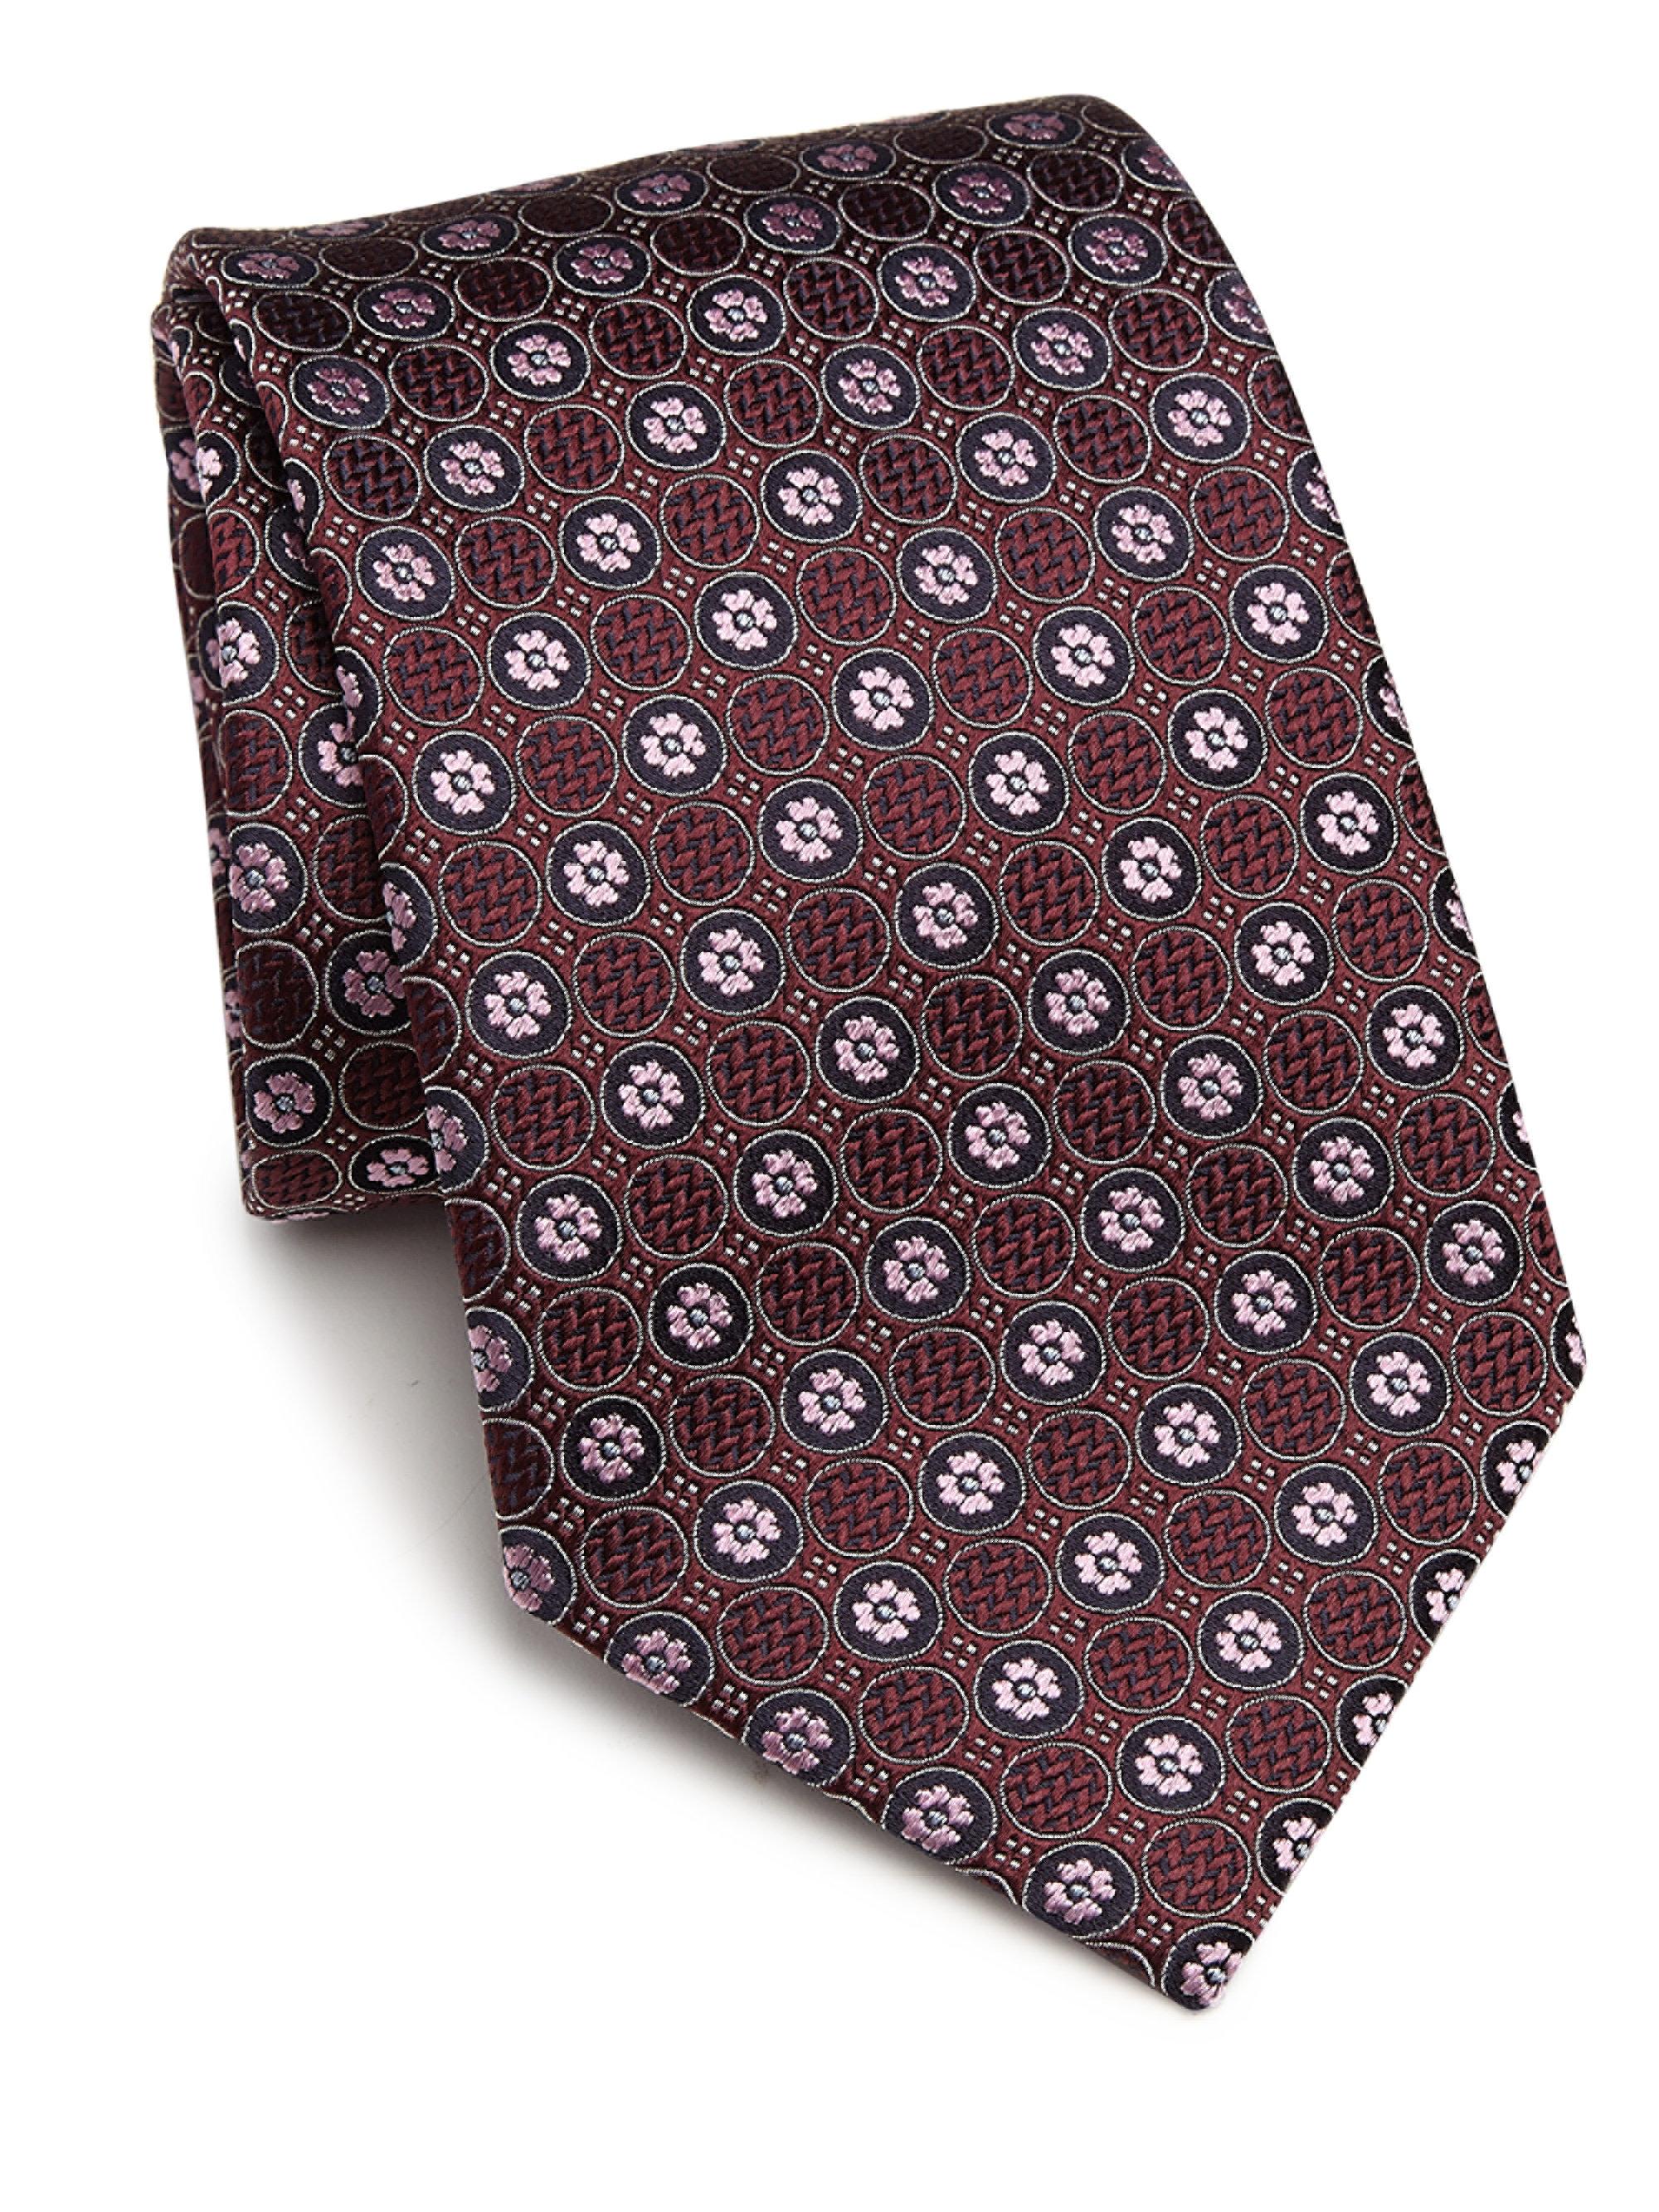 Ermenegildo zegna floral embroidered silk tie in red for